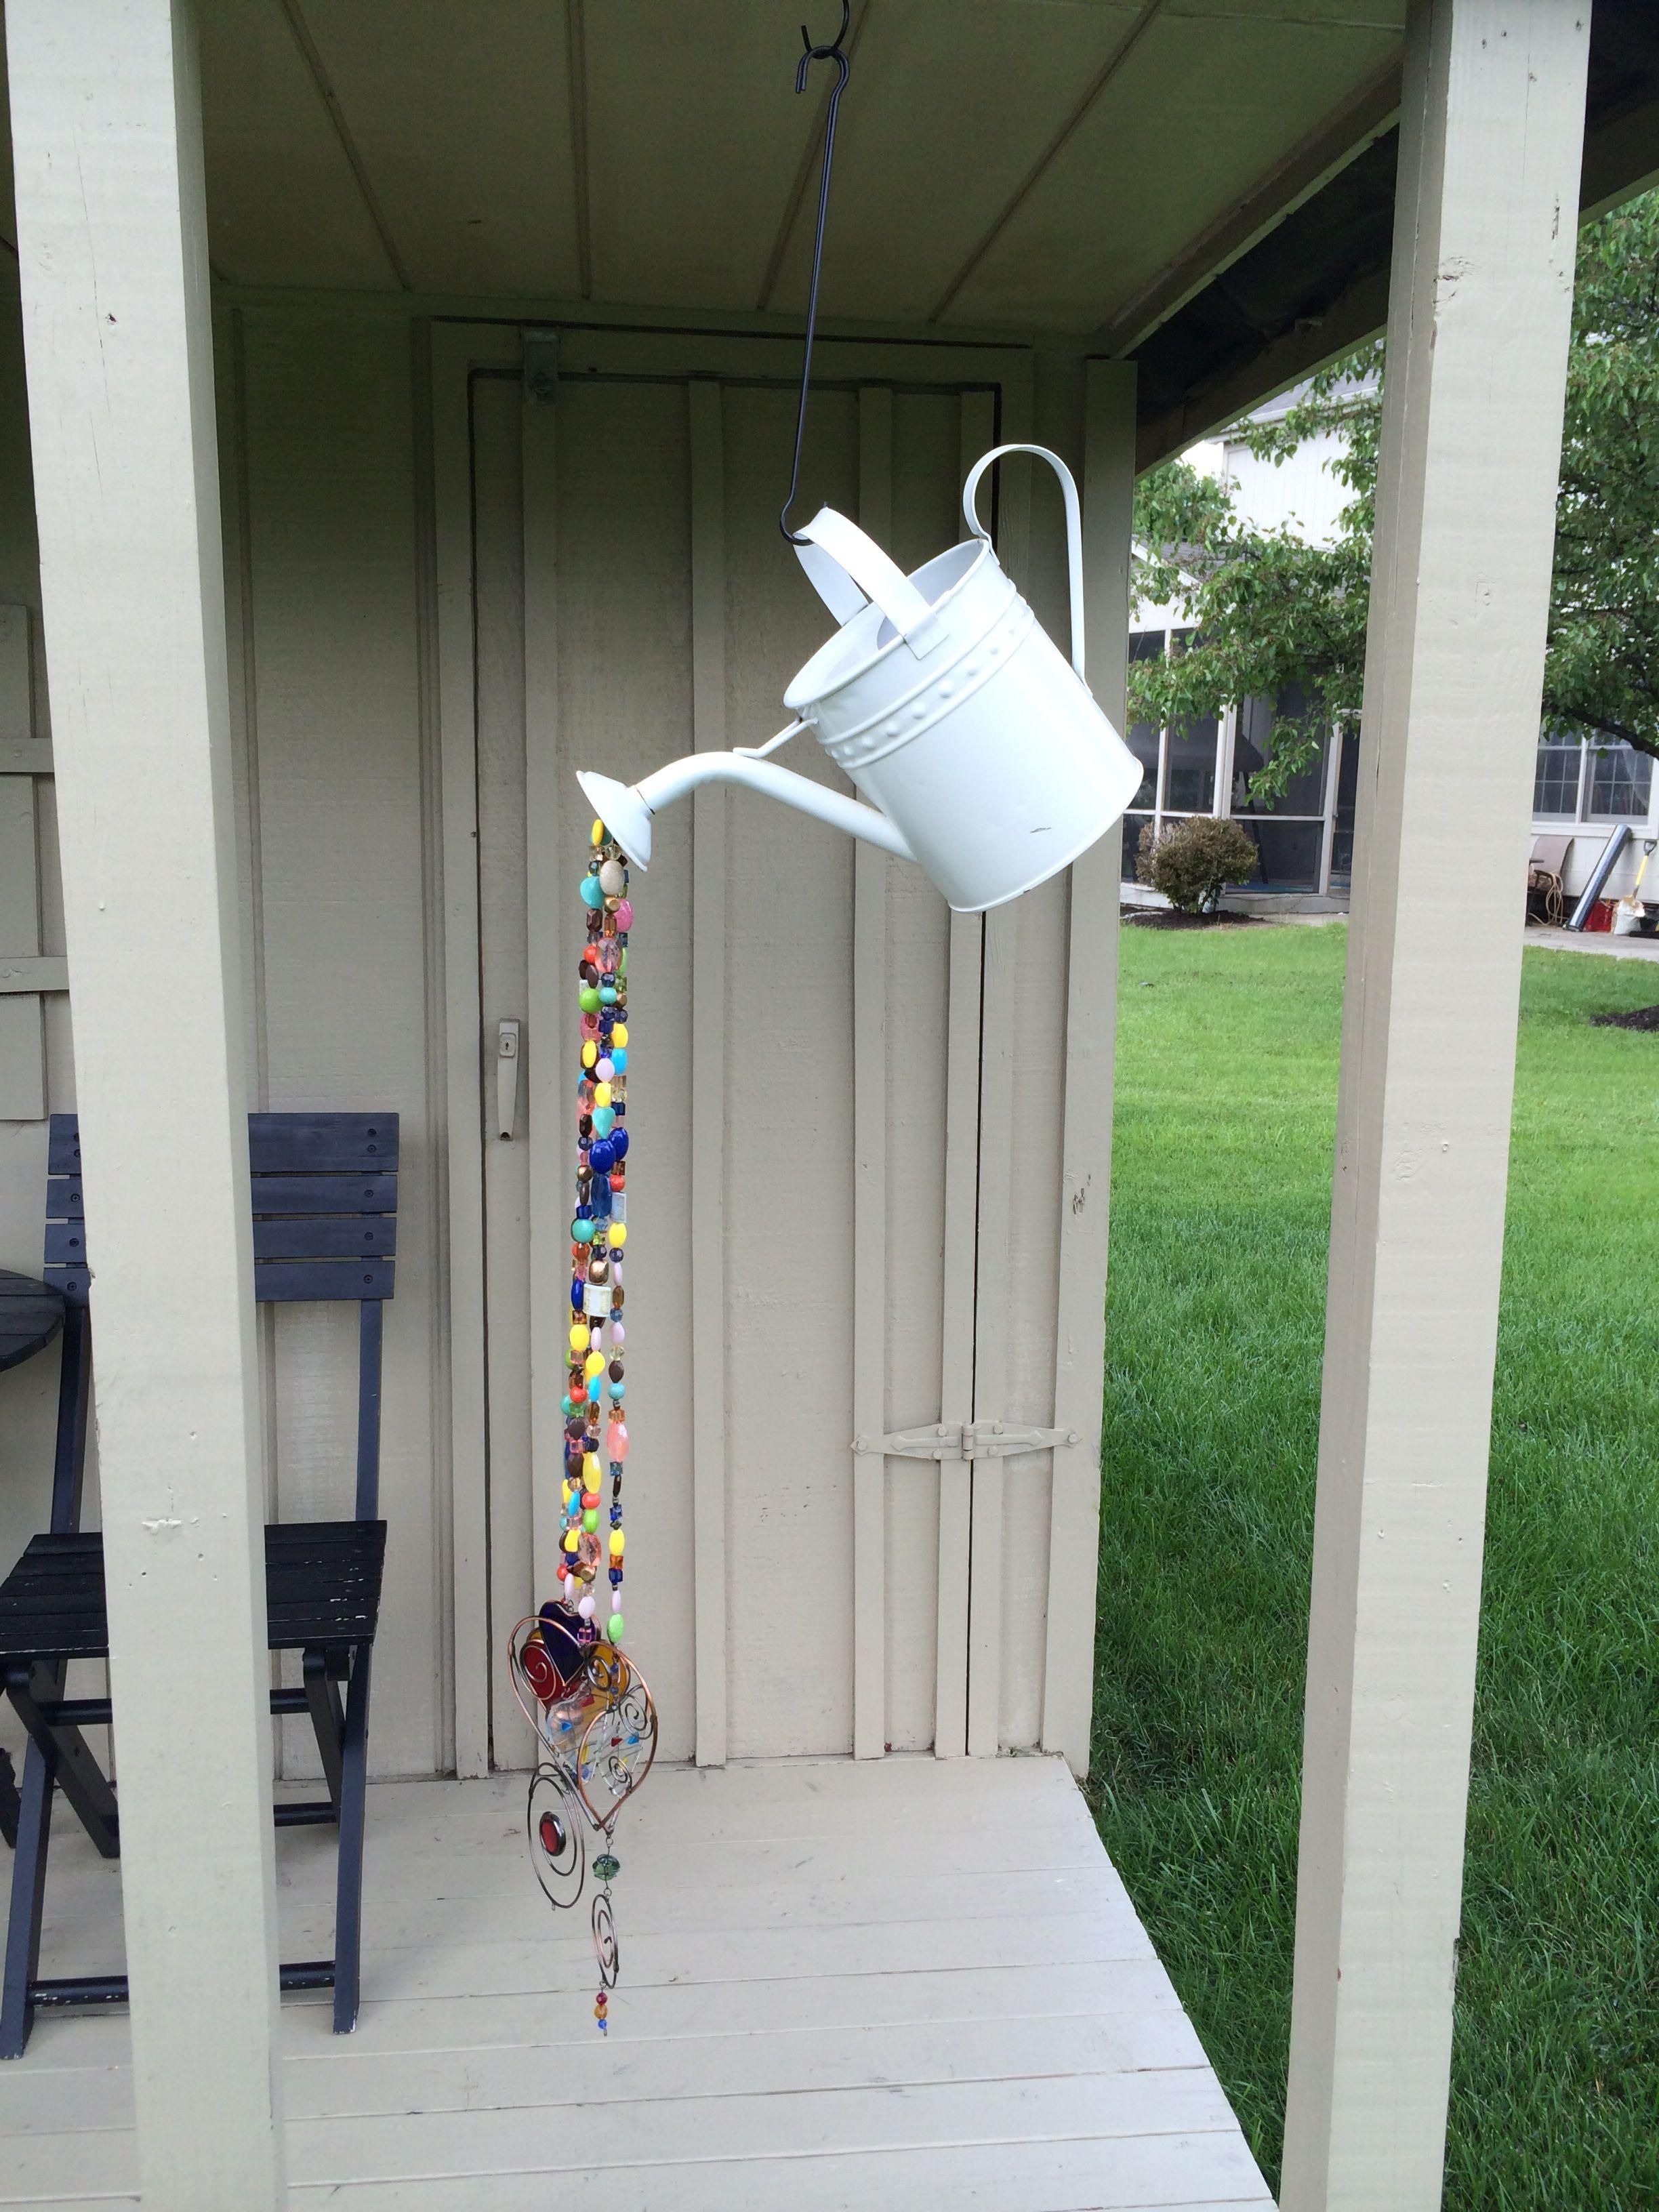 3 Easy Diy Storage Ideas For Small Kitchen: 20 Unique DIY Wind Chimes